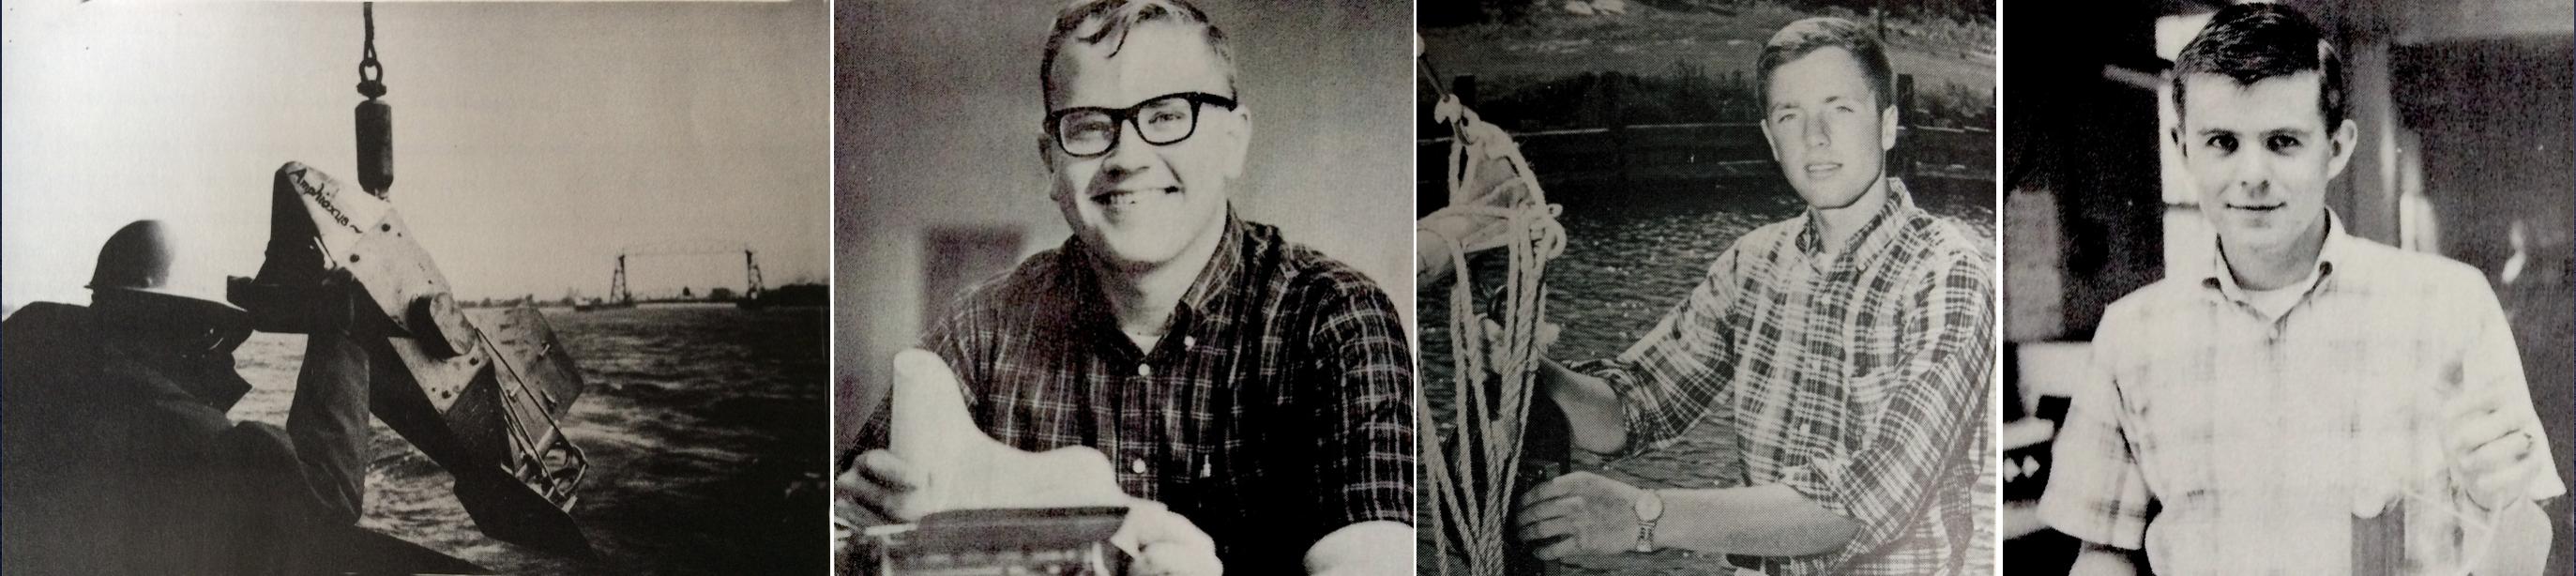 continous plankton recorder, archie, jon, and ed